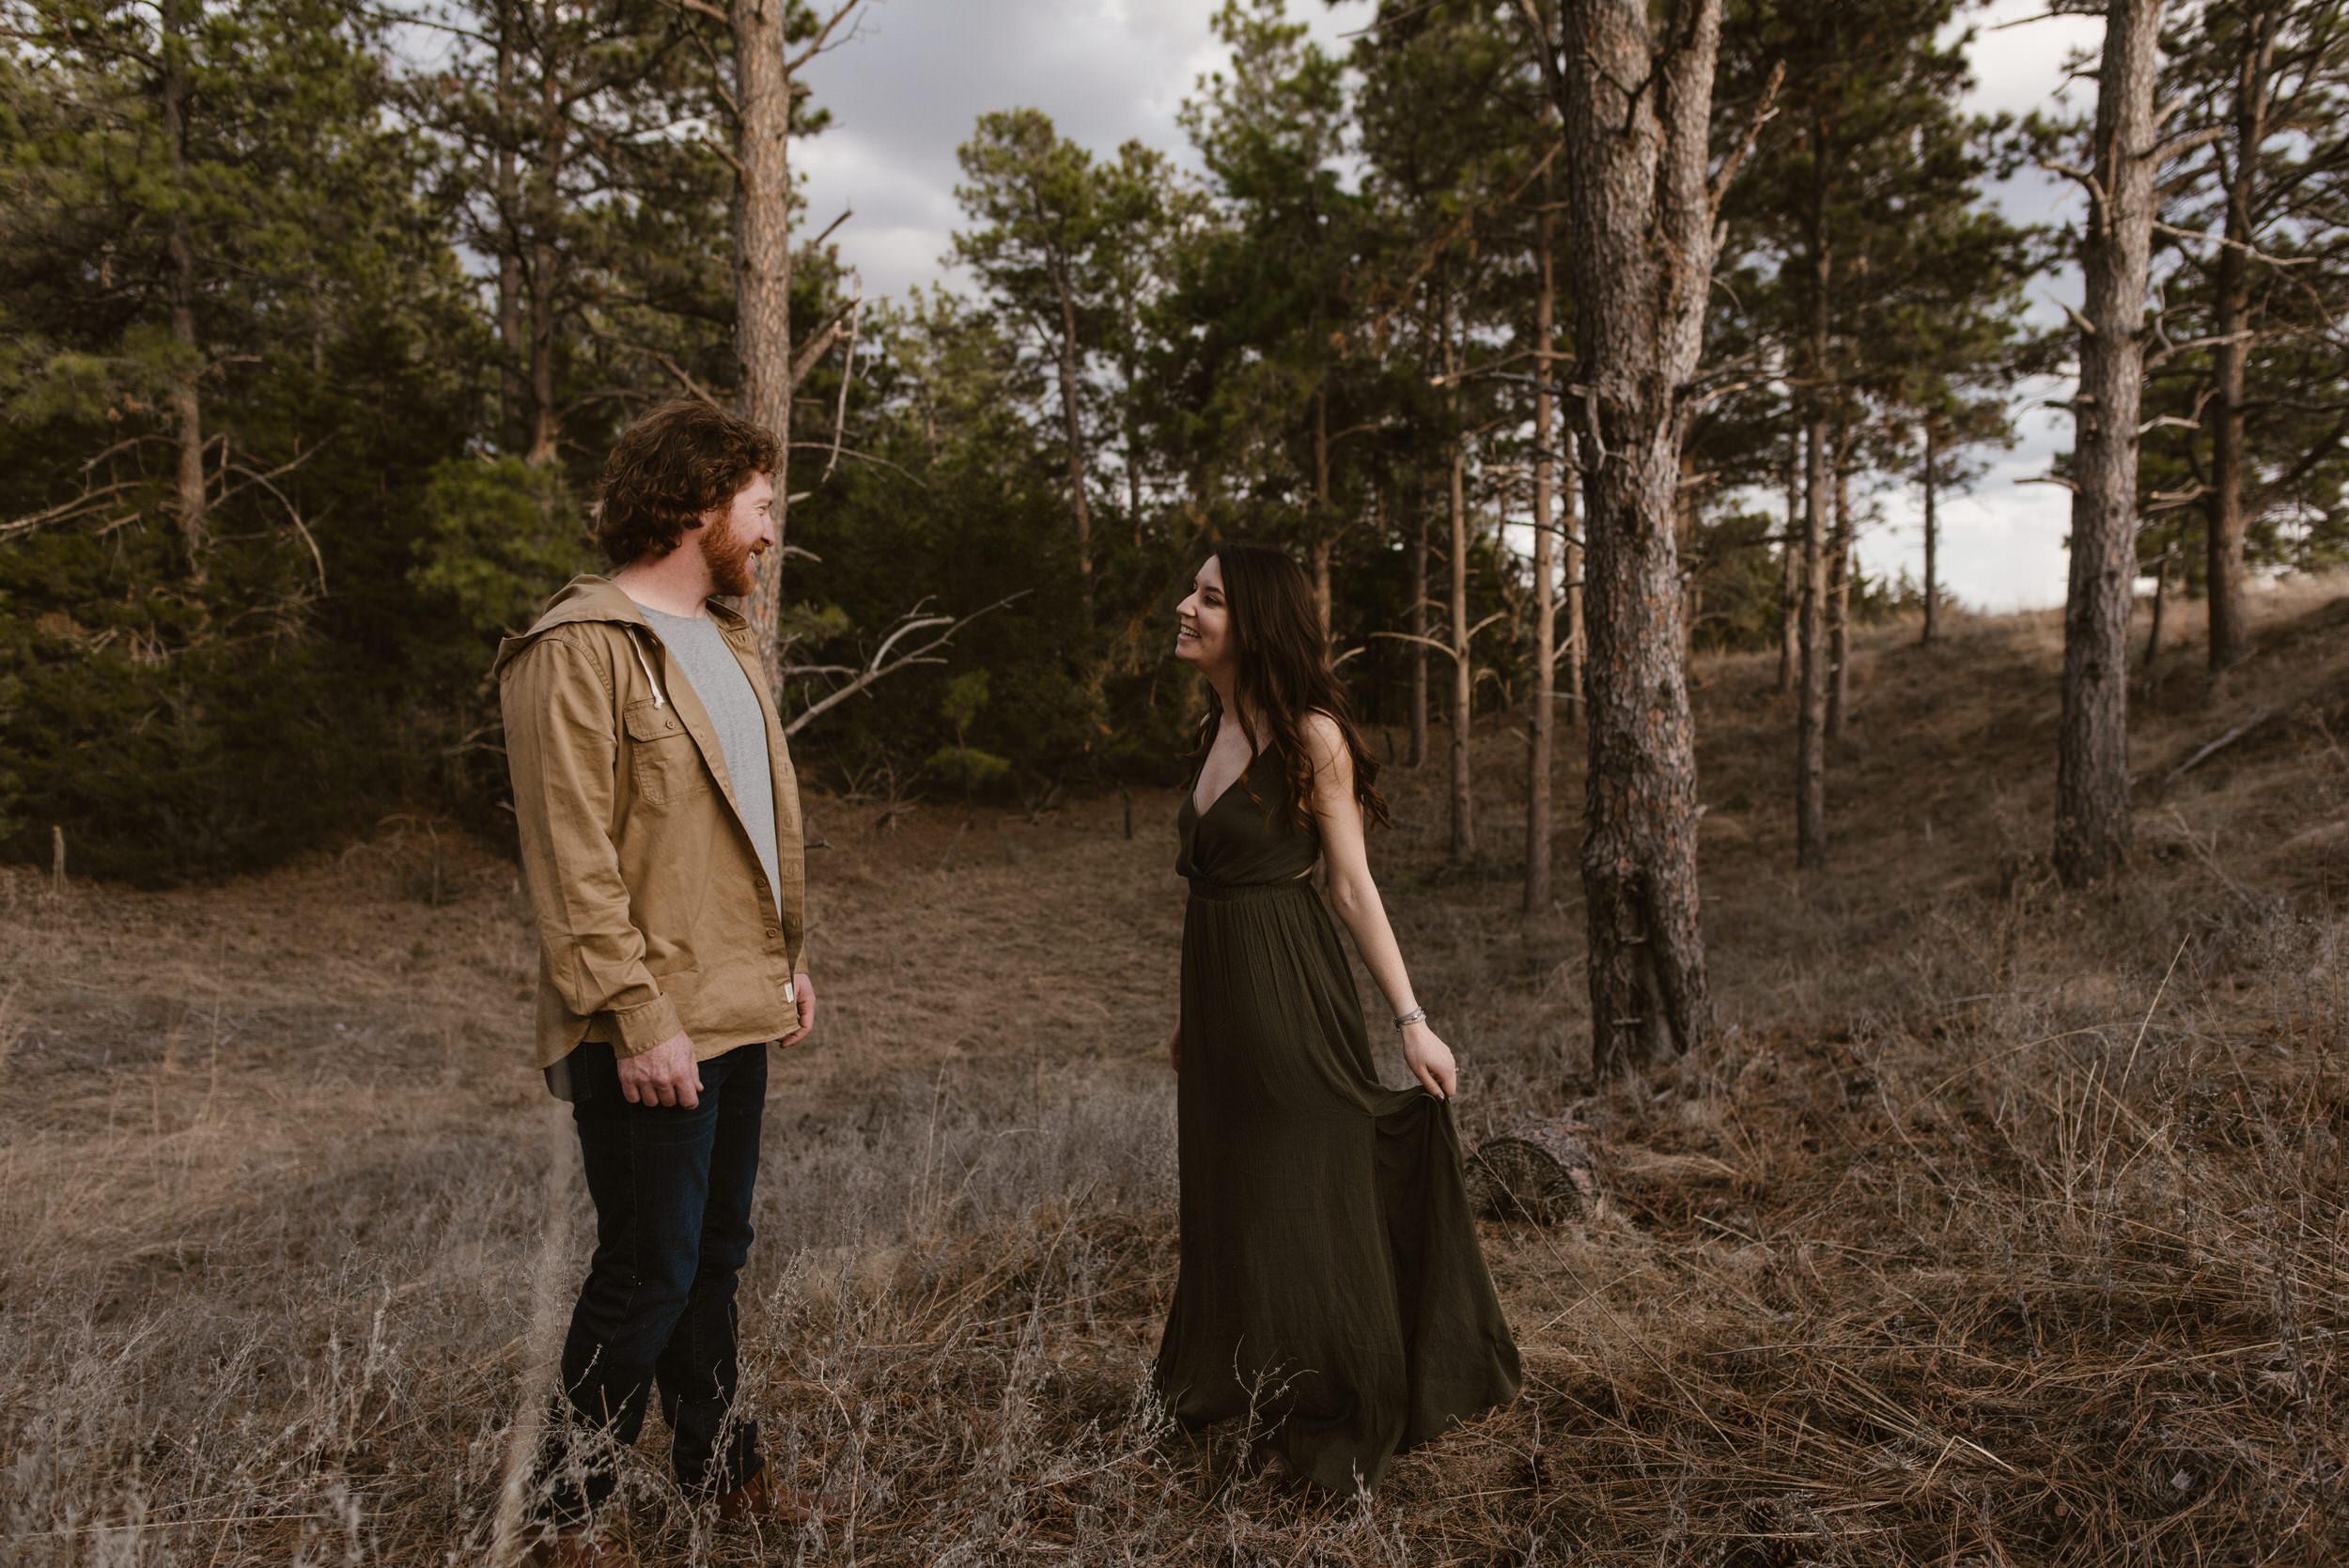 Nebraska-Engagement-Session-Halsey-Forest-Kaylie-Sirek-Photography-033.jpg